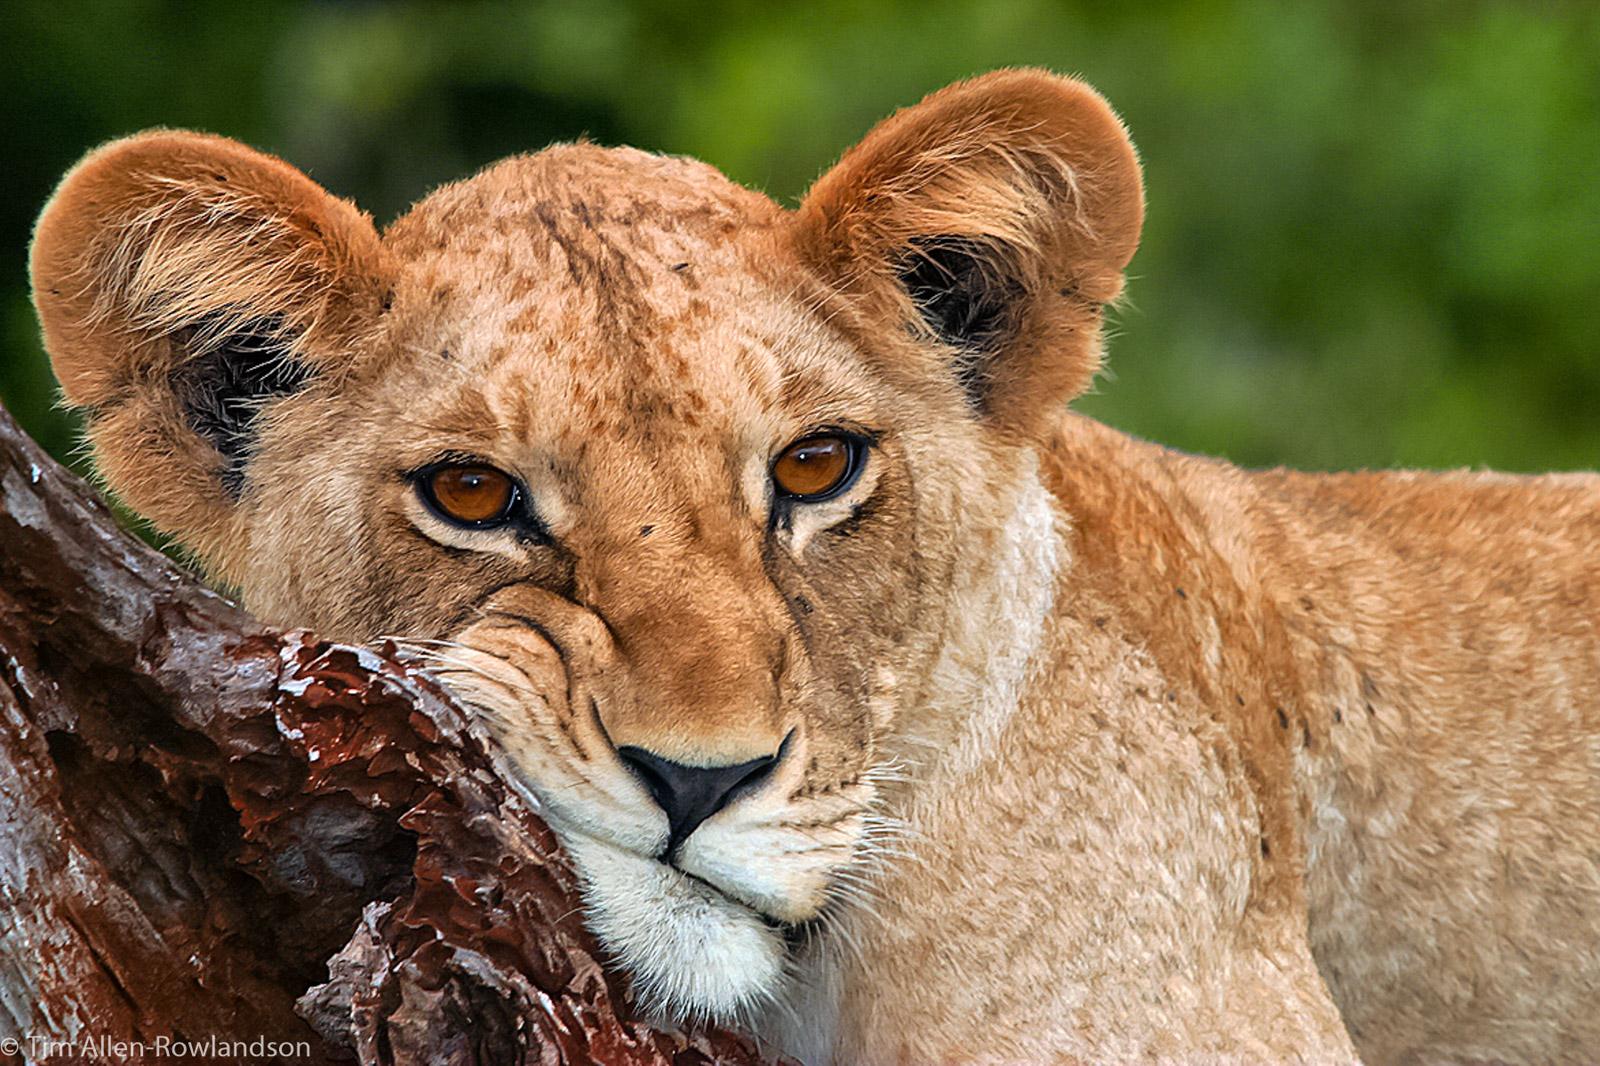 Lion cub resting on a fallen tree trunk, Tsavo